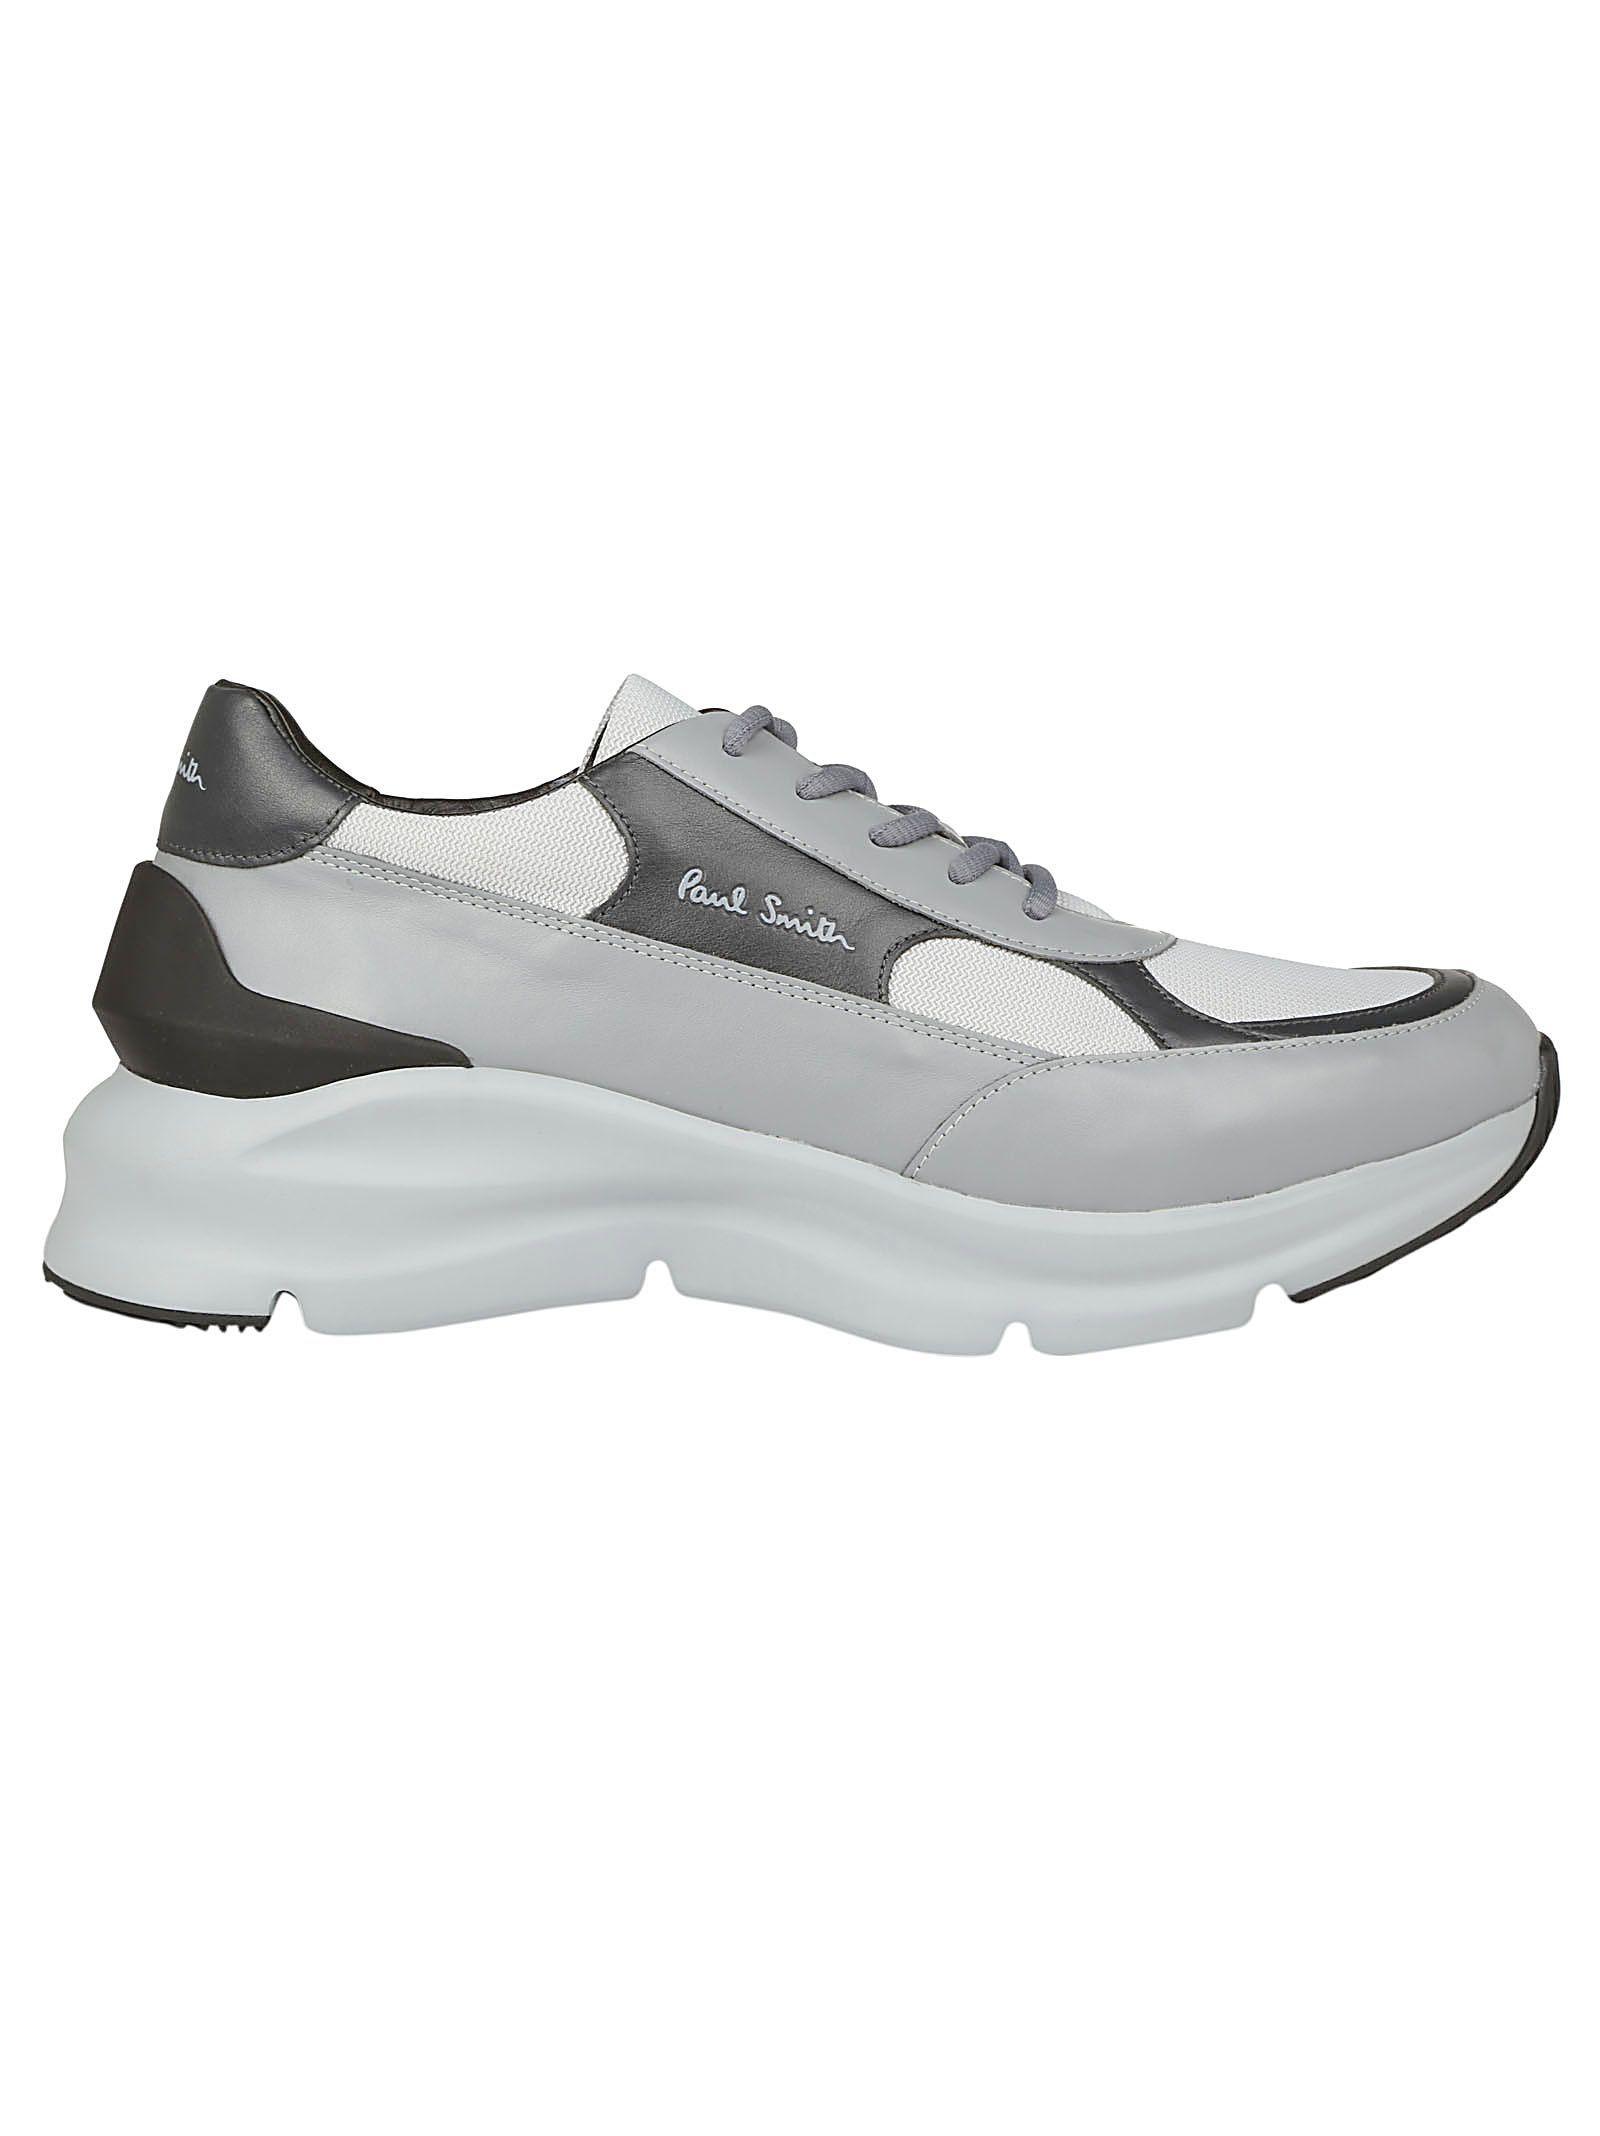 Paul Smith Explorer Sneaker in 2020 | Sneakers, Paul smith